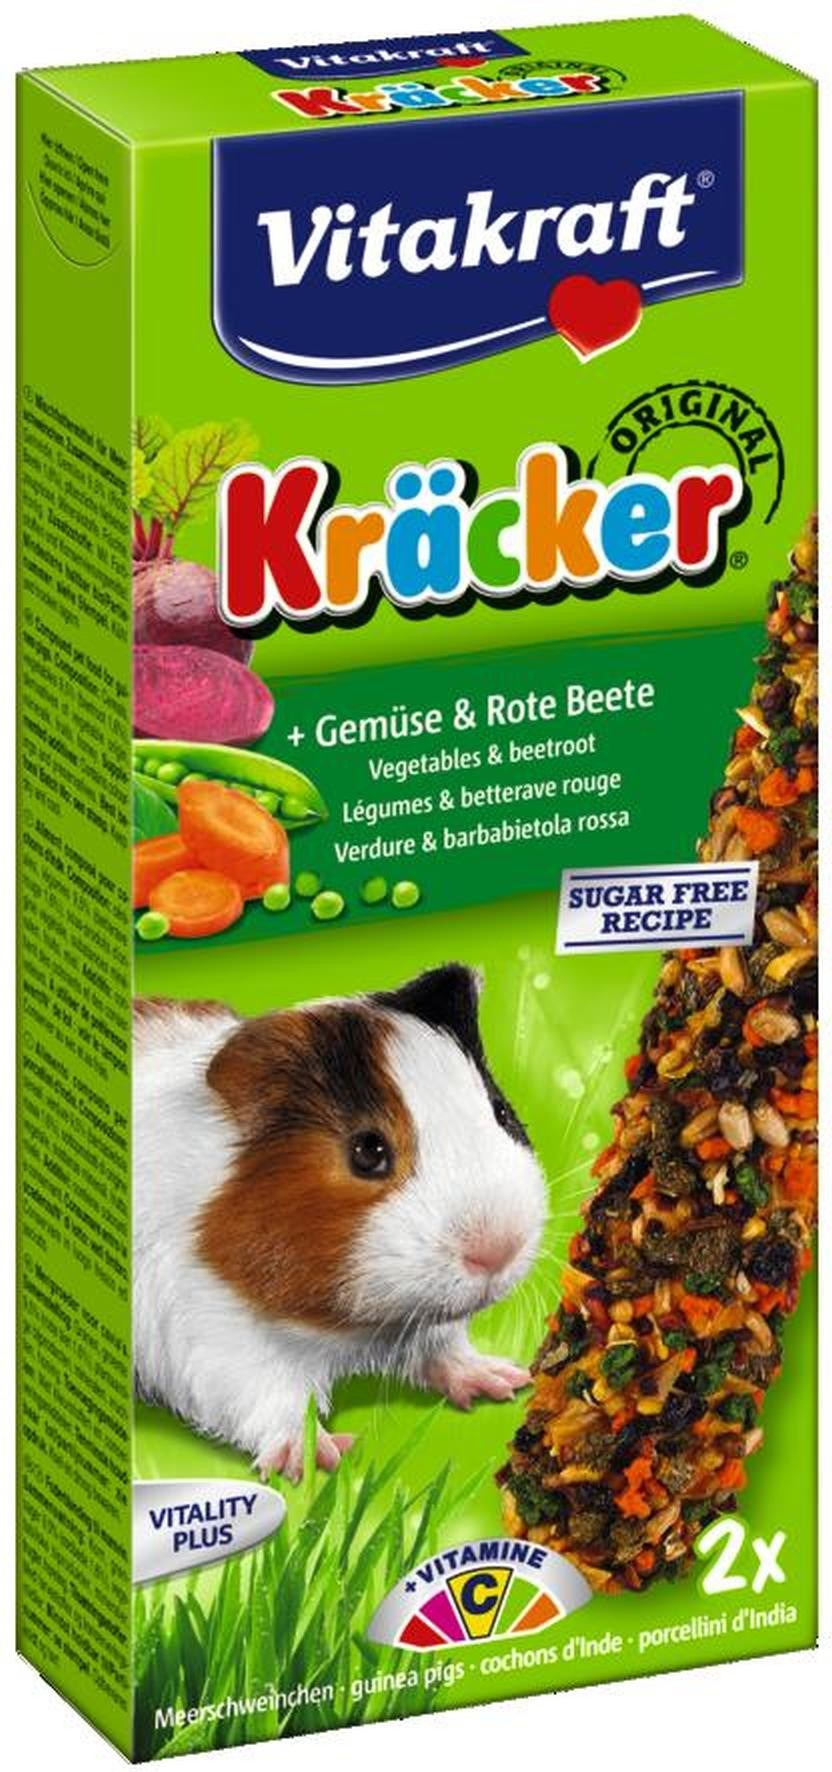 Vitakraft groente/biet-kracker cavia 2in1